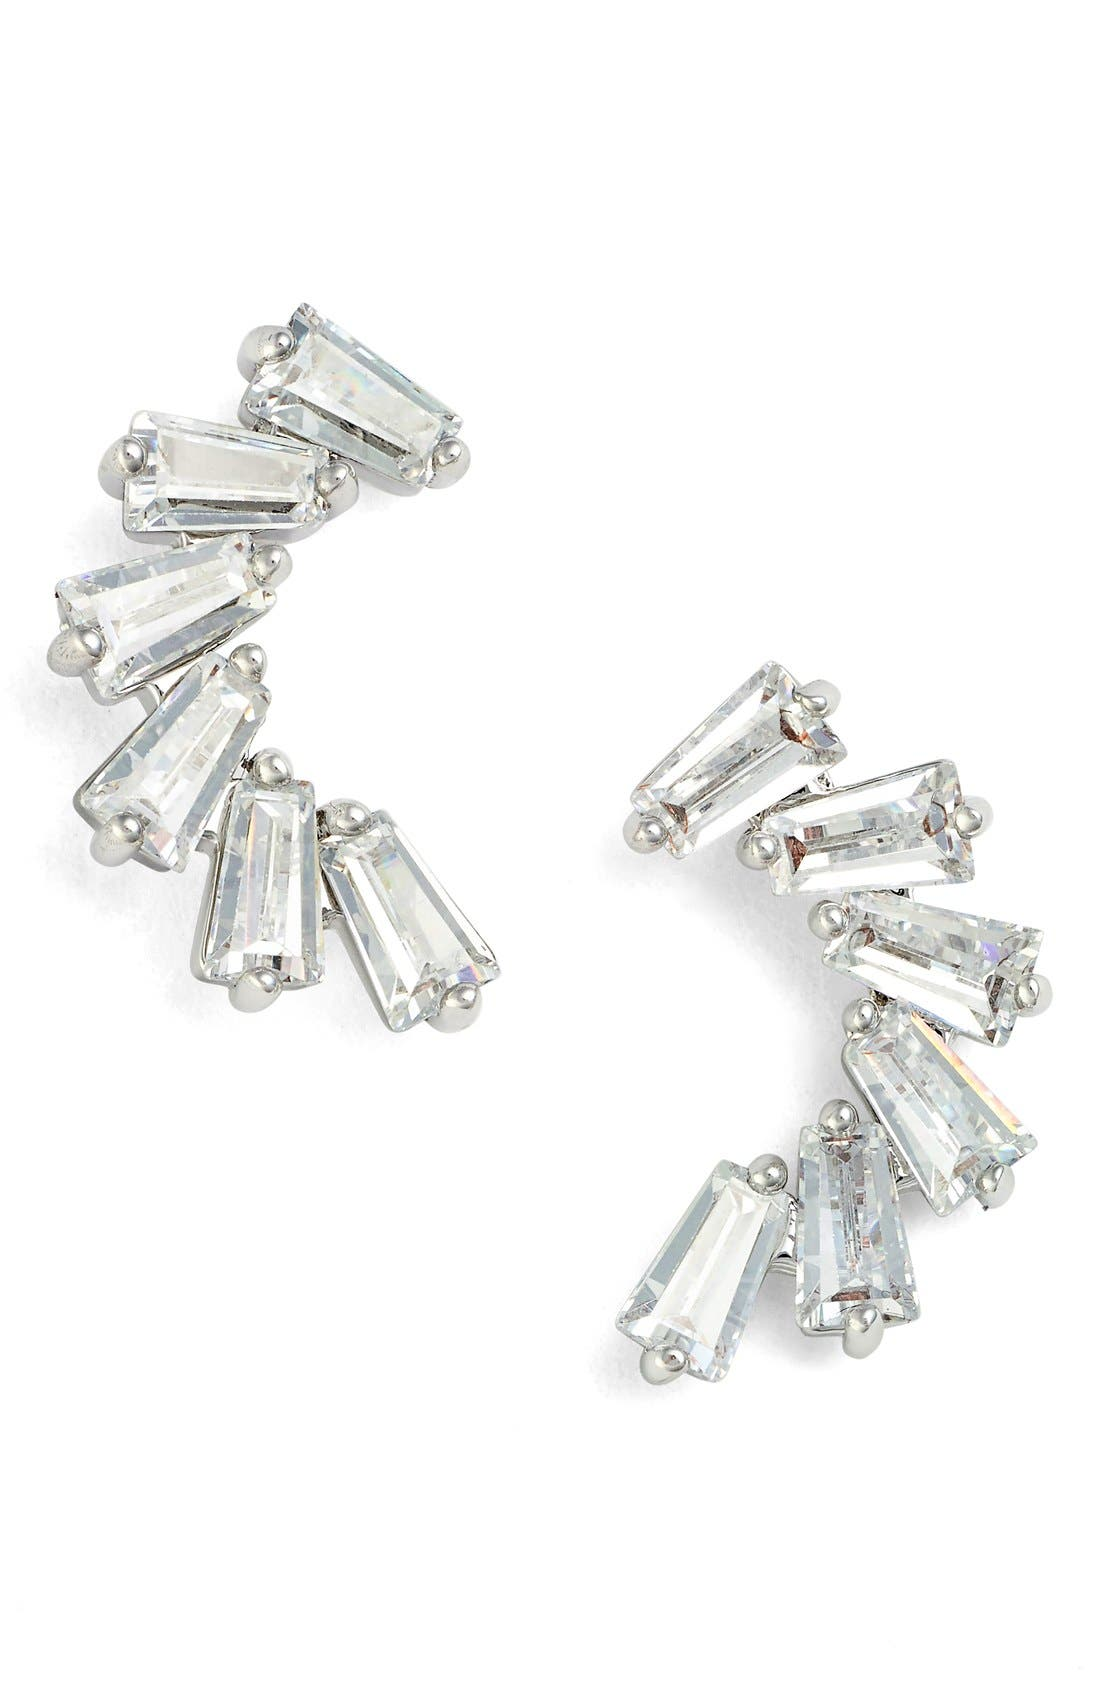 CZ by Kenneth Jay Lane Curved Baguette Cubic Zirconia Stud Earrings